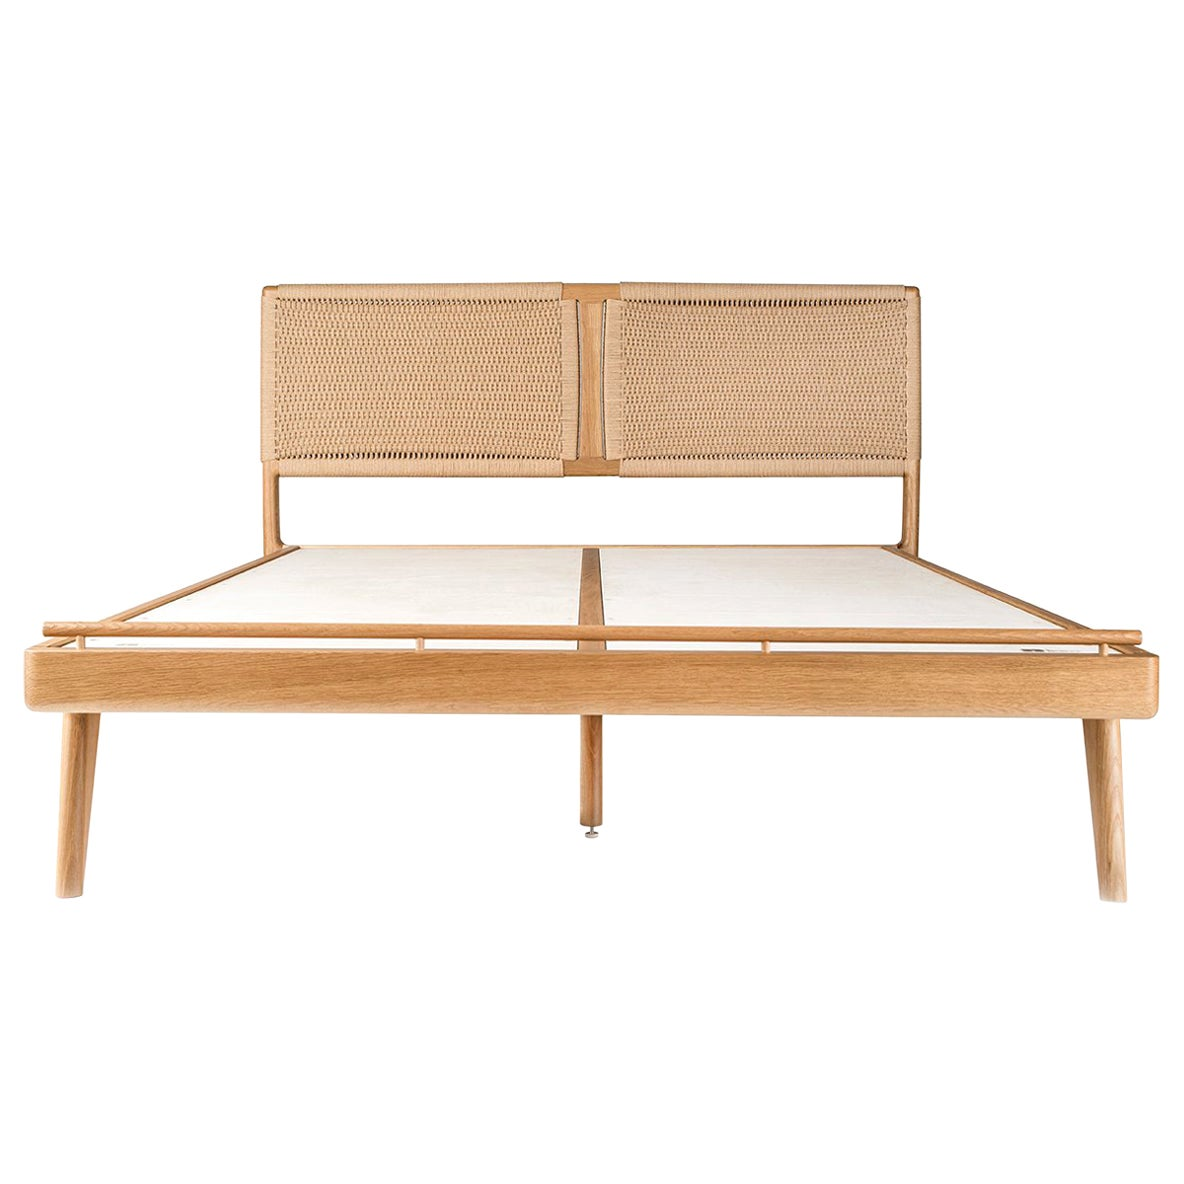 Bed, Cali King, Danish Cord, Woven Headboard, Mid-Century Modern-Style, Hardwood